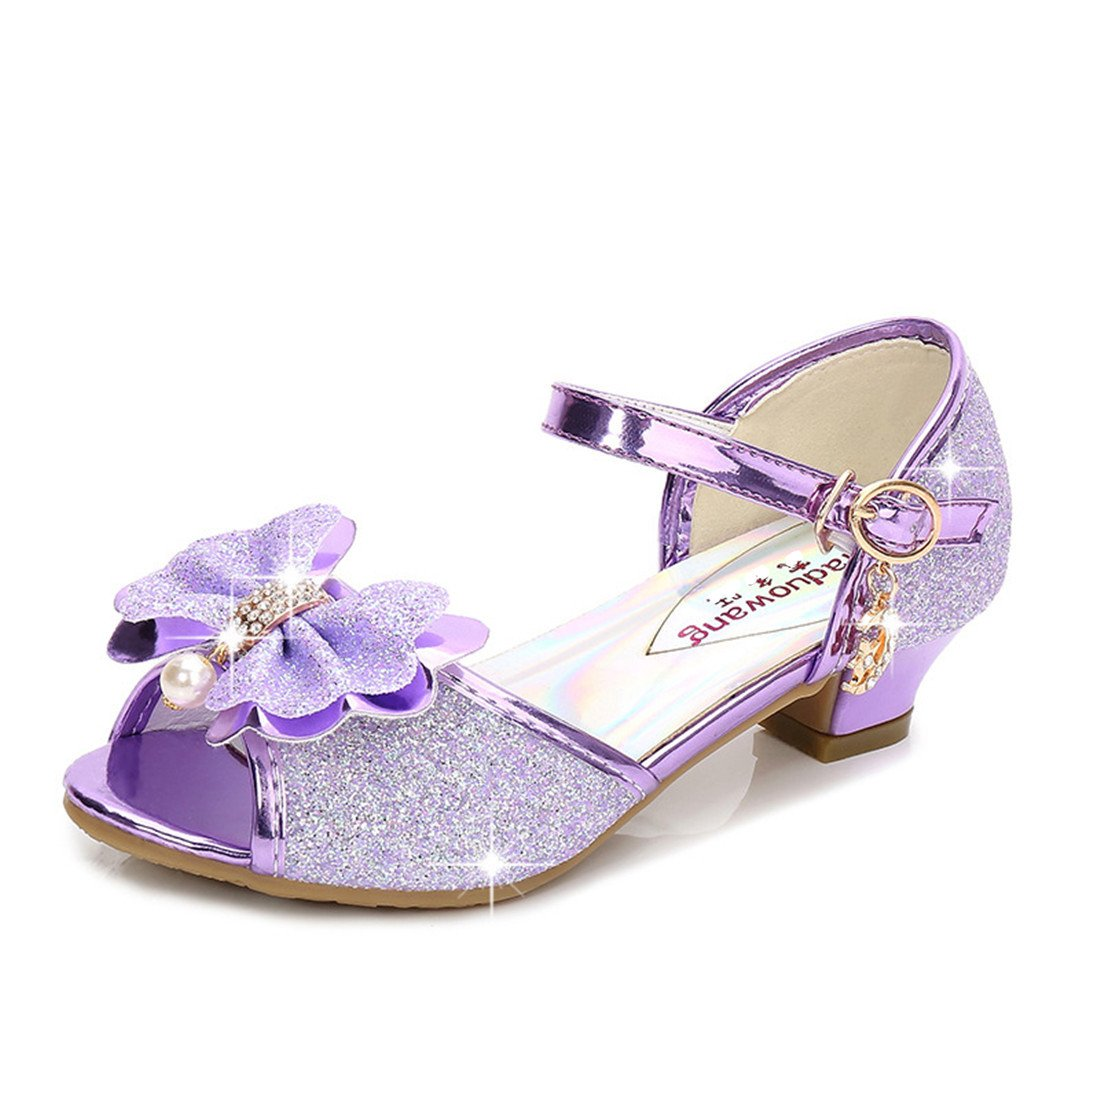 KISSOURBABY Low Heel Sandals for Girls Light Purple Toddler Wedding Dress Shoes Size 11 Princess Sequin Little Girls Cute Rhinestone (Purple 26)